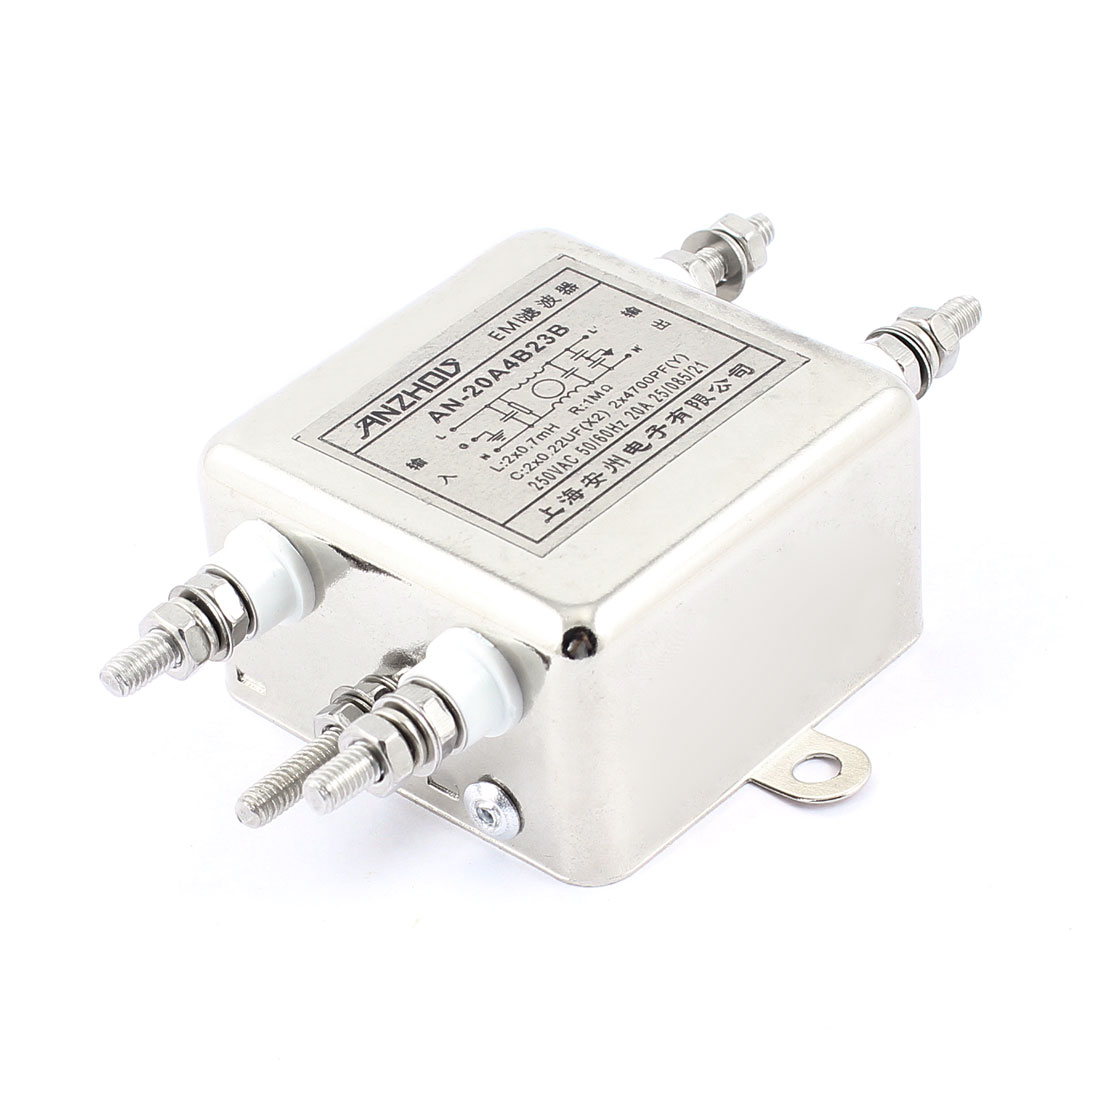 Metal Case 20A AC 250V 50/60Hz AN-20A4B23B Power Line EMI Filter